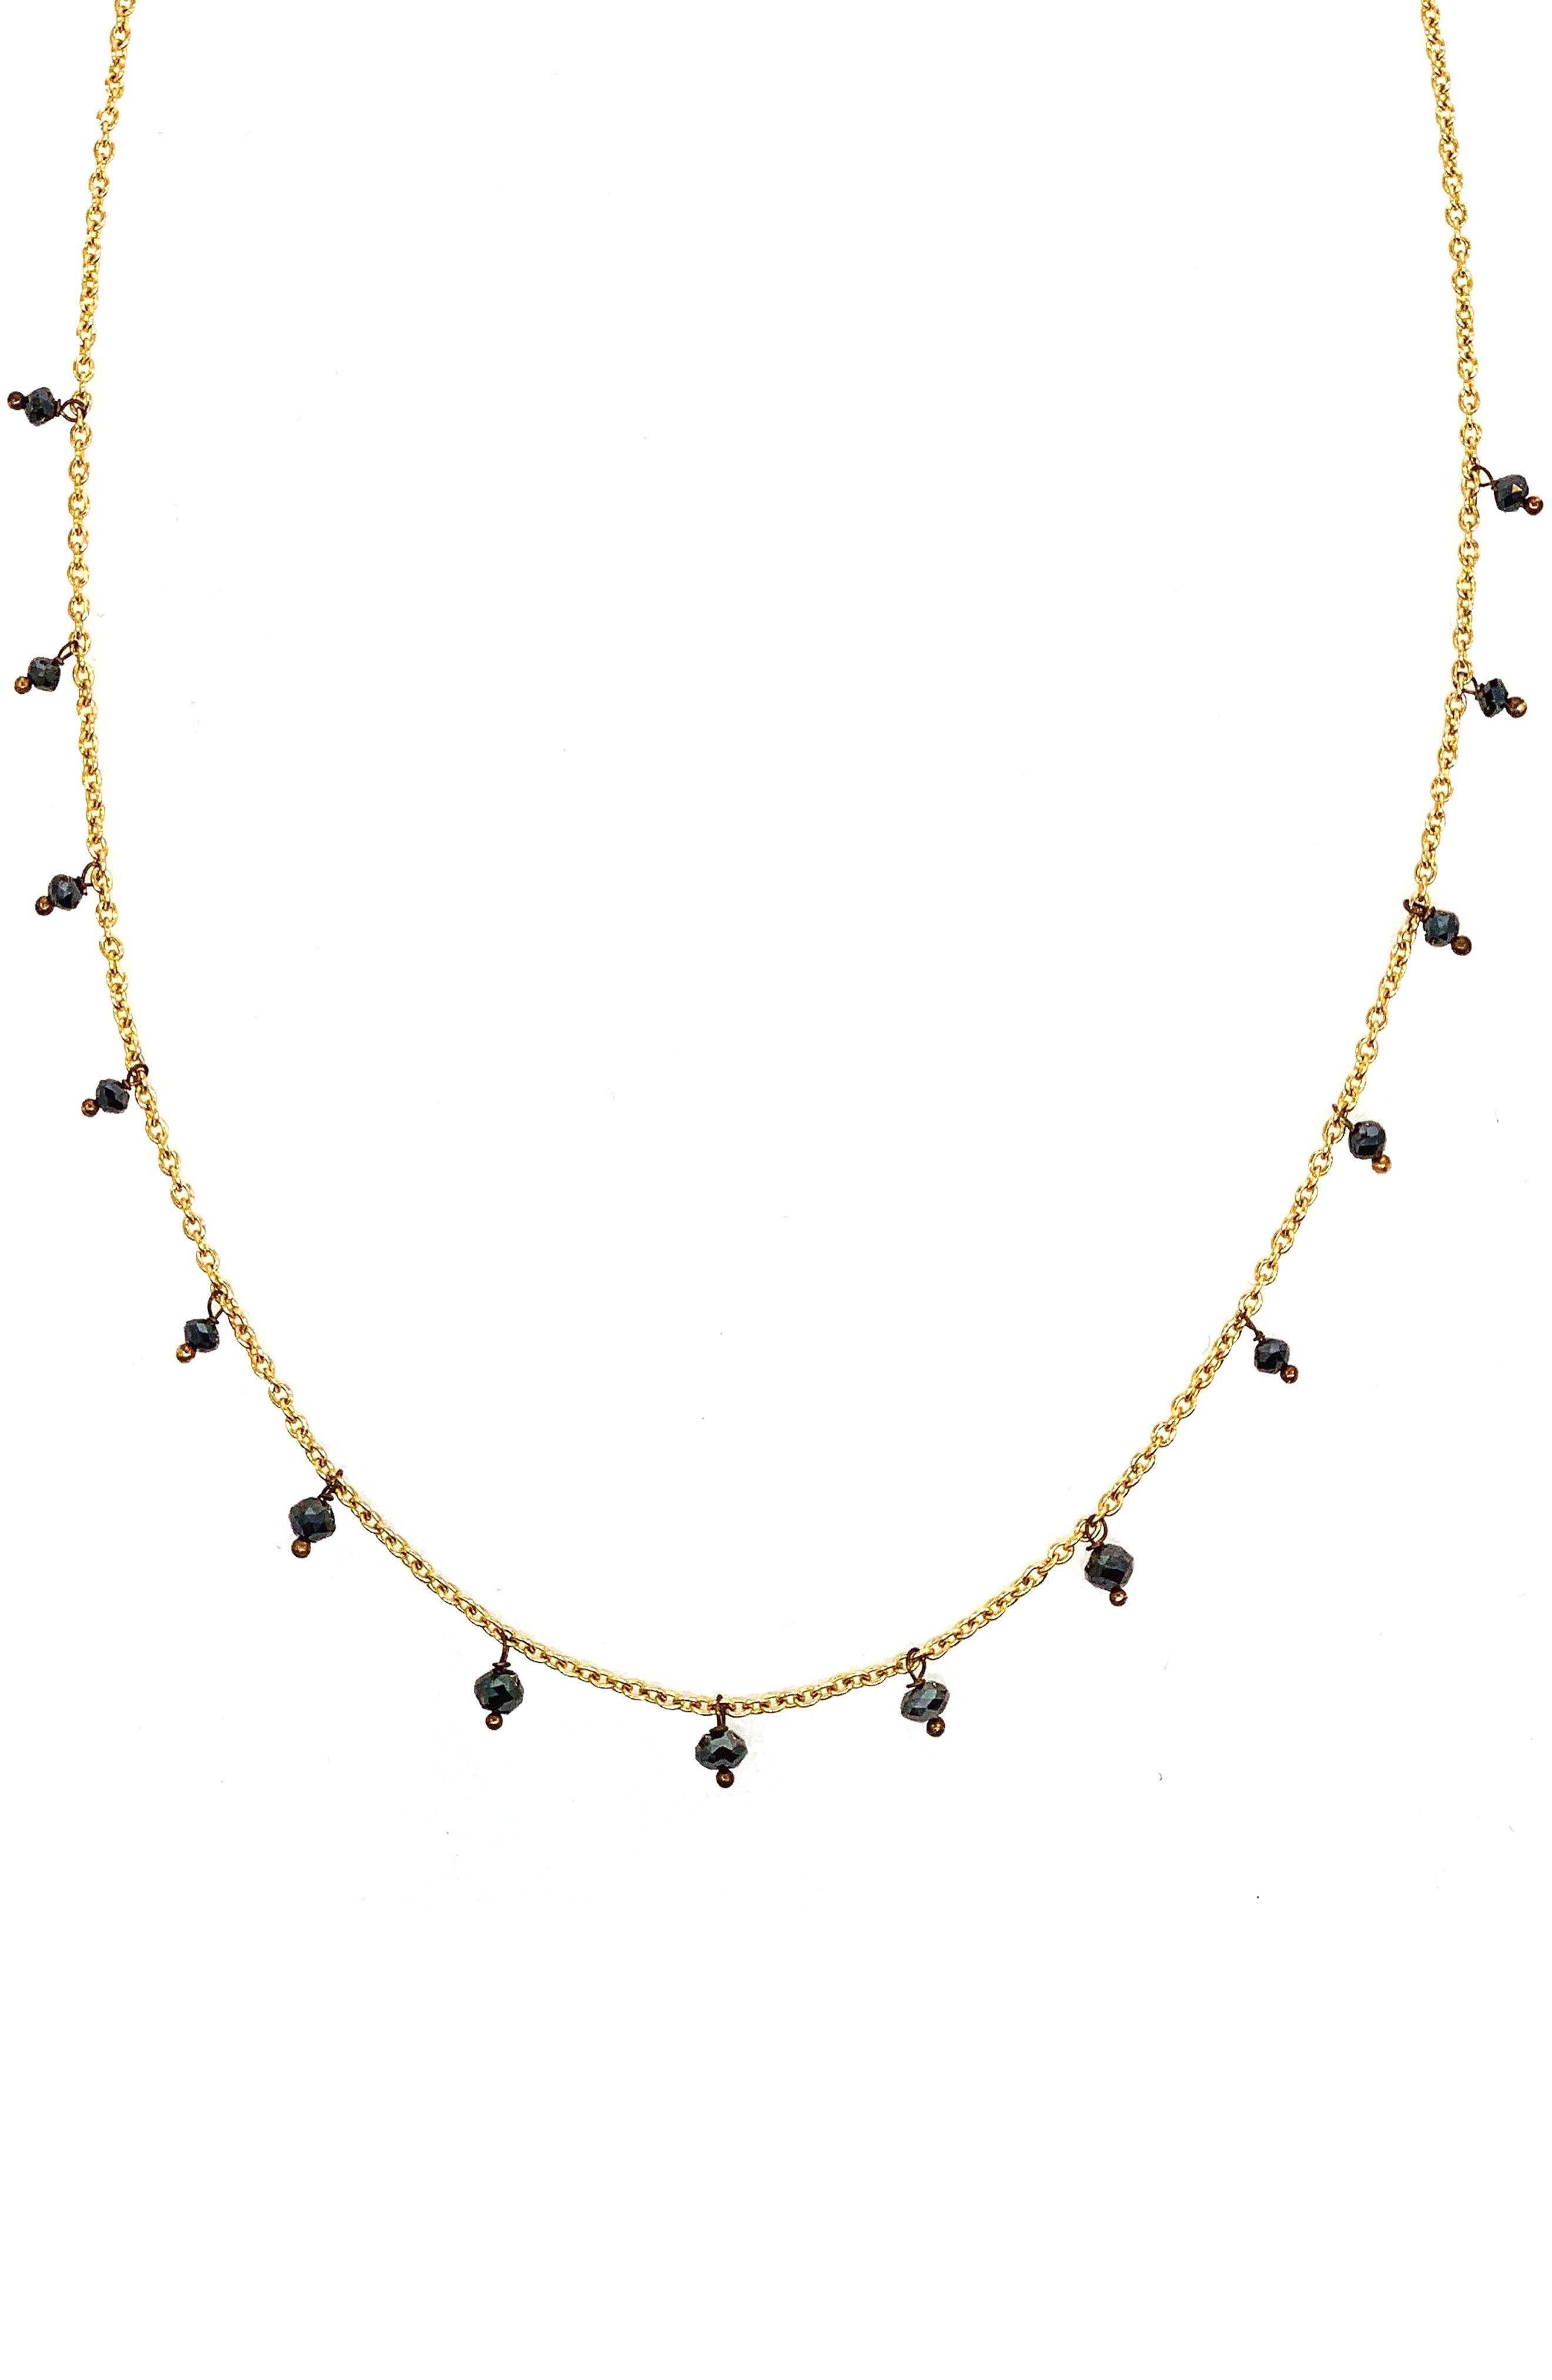 SETHI COUTURE Black Diamond Drop Necklace in Yellow Gold/ Diamond